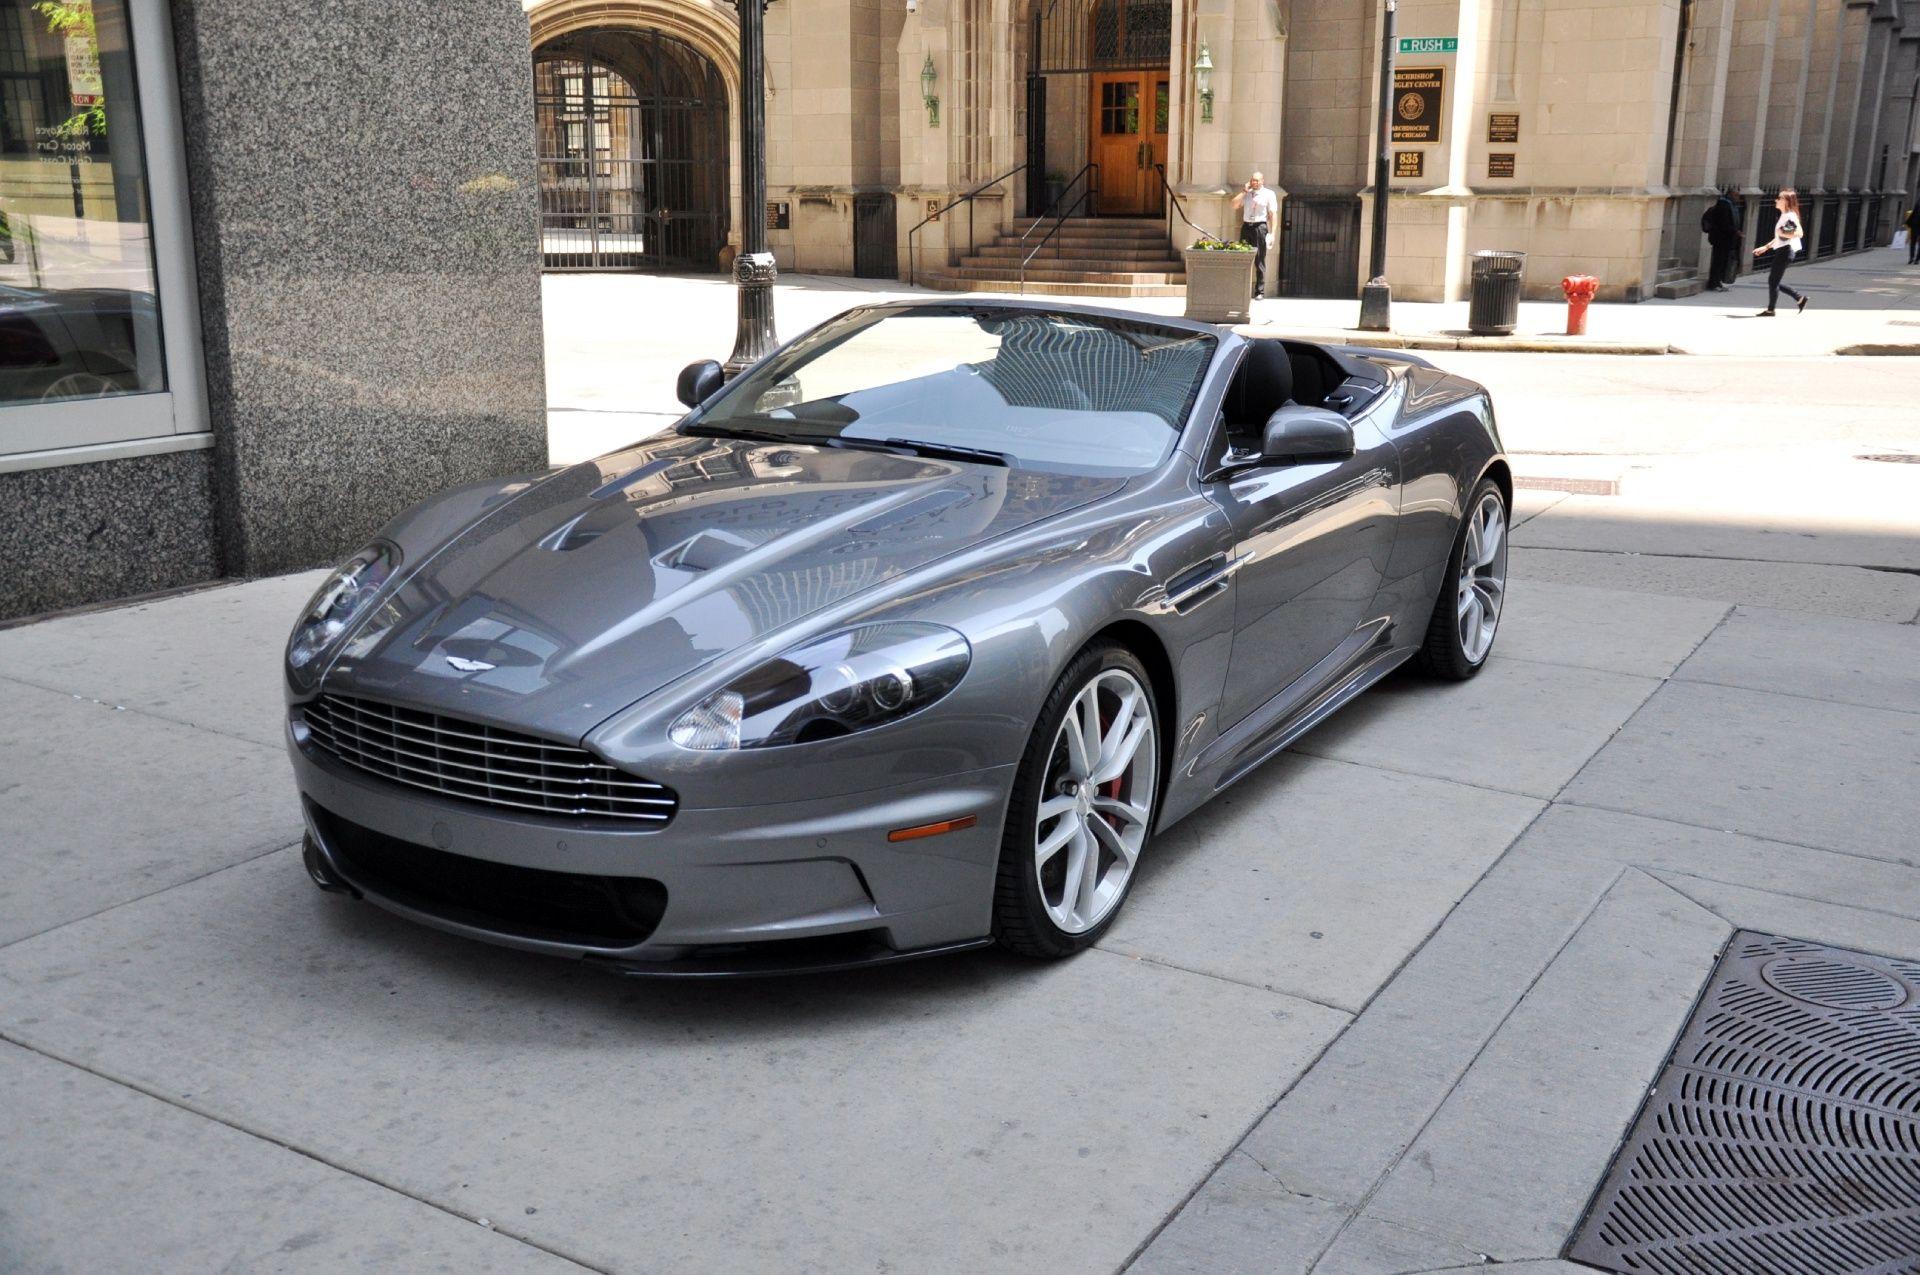 2012 Aston Martin DBS Convertible | Convertibles | Pinterest | Aston ...